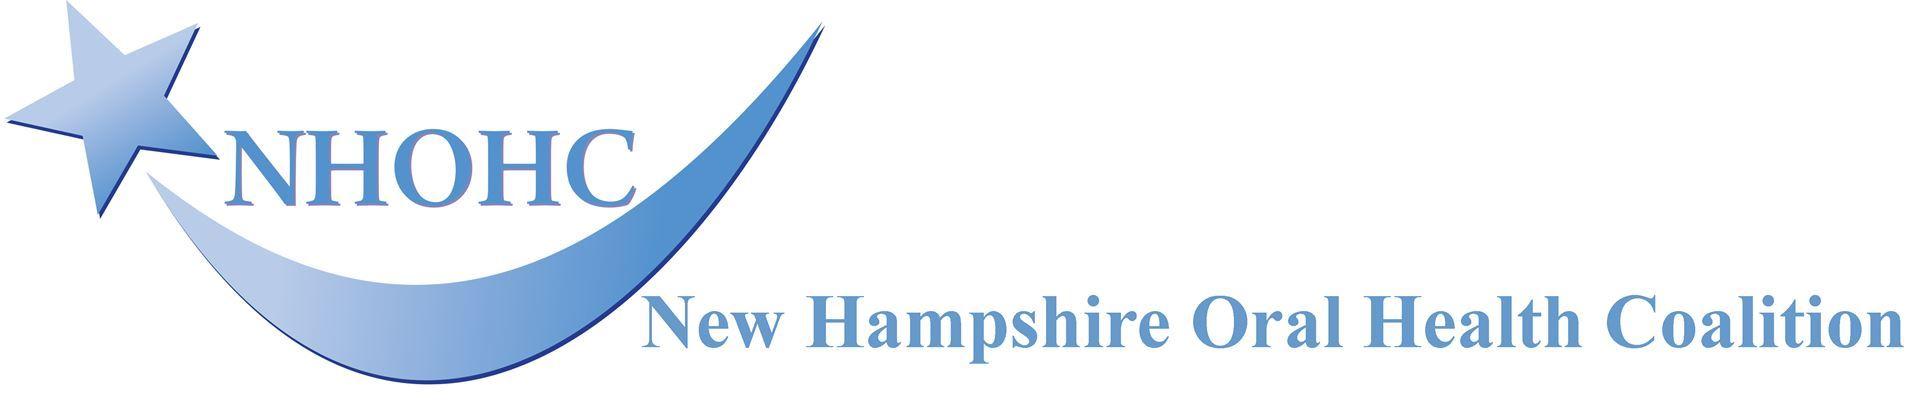 NHOHC Logo